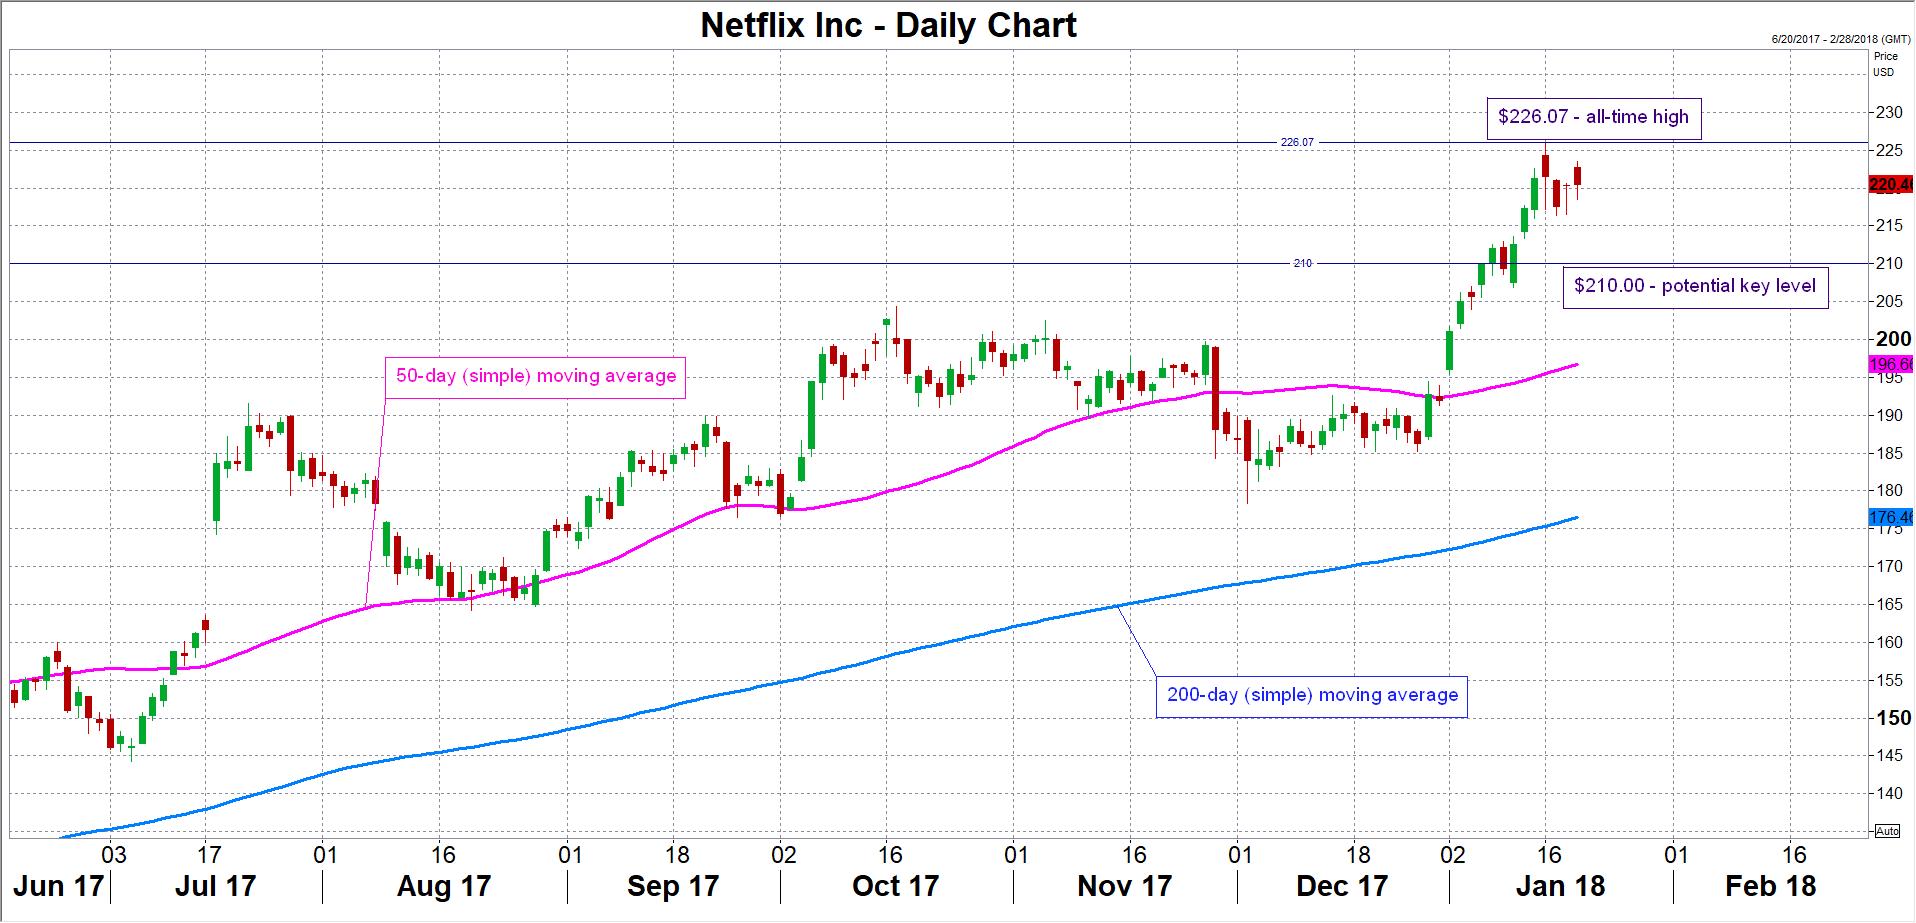 stock market news  u2013 netflix reports quarterly results